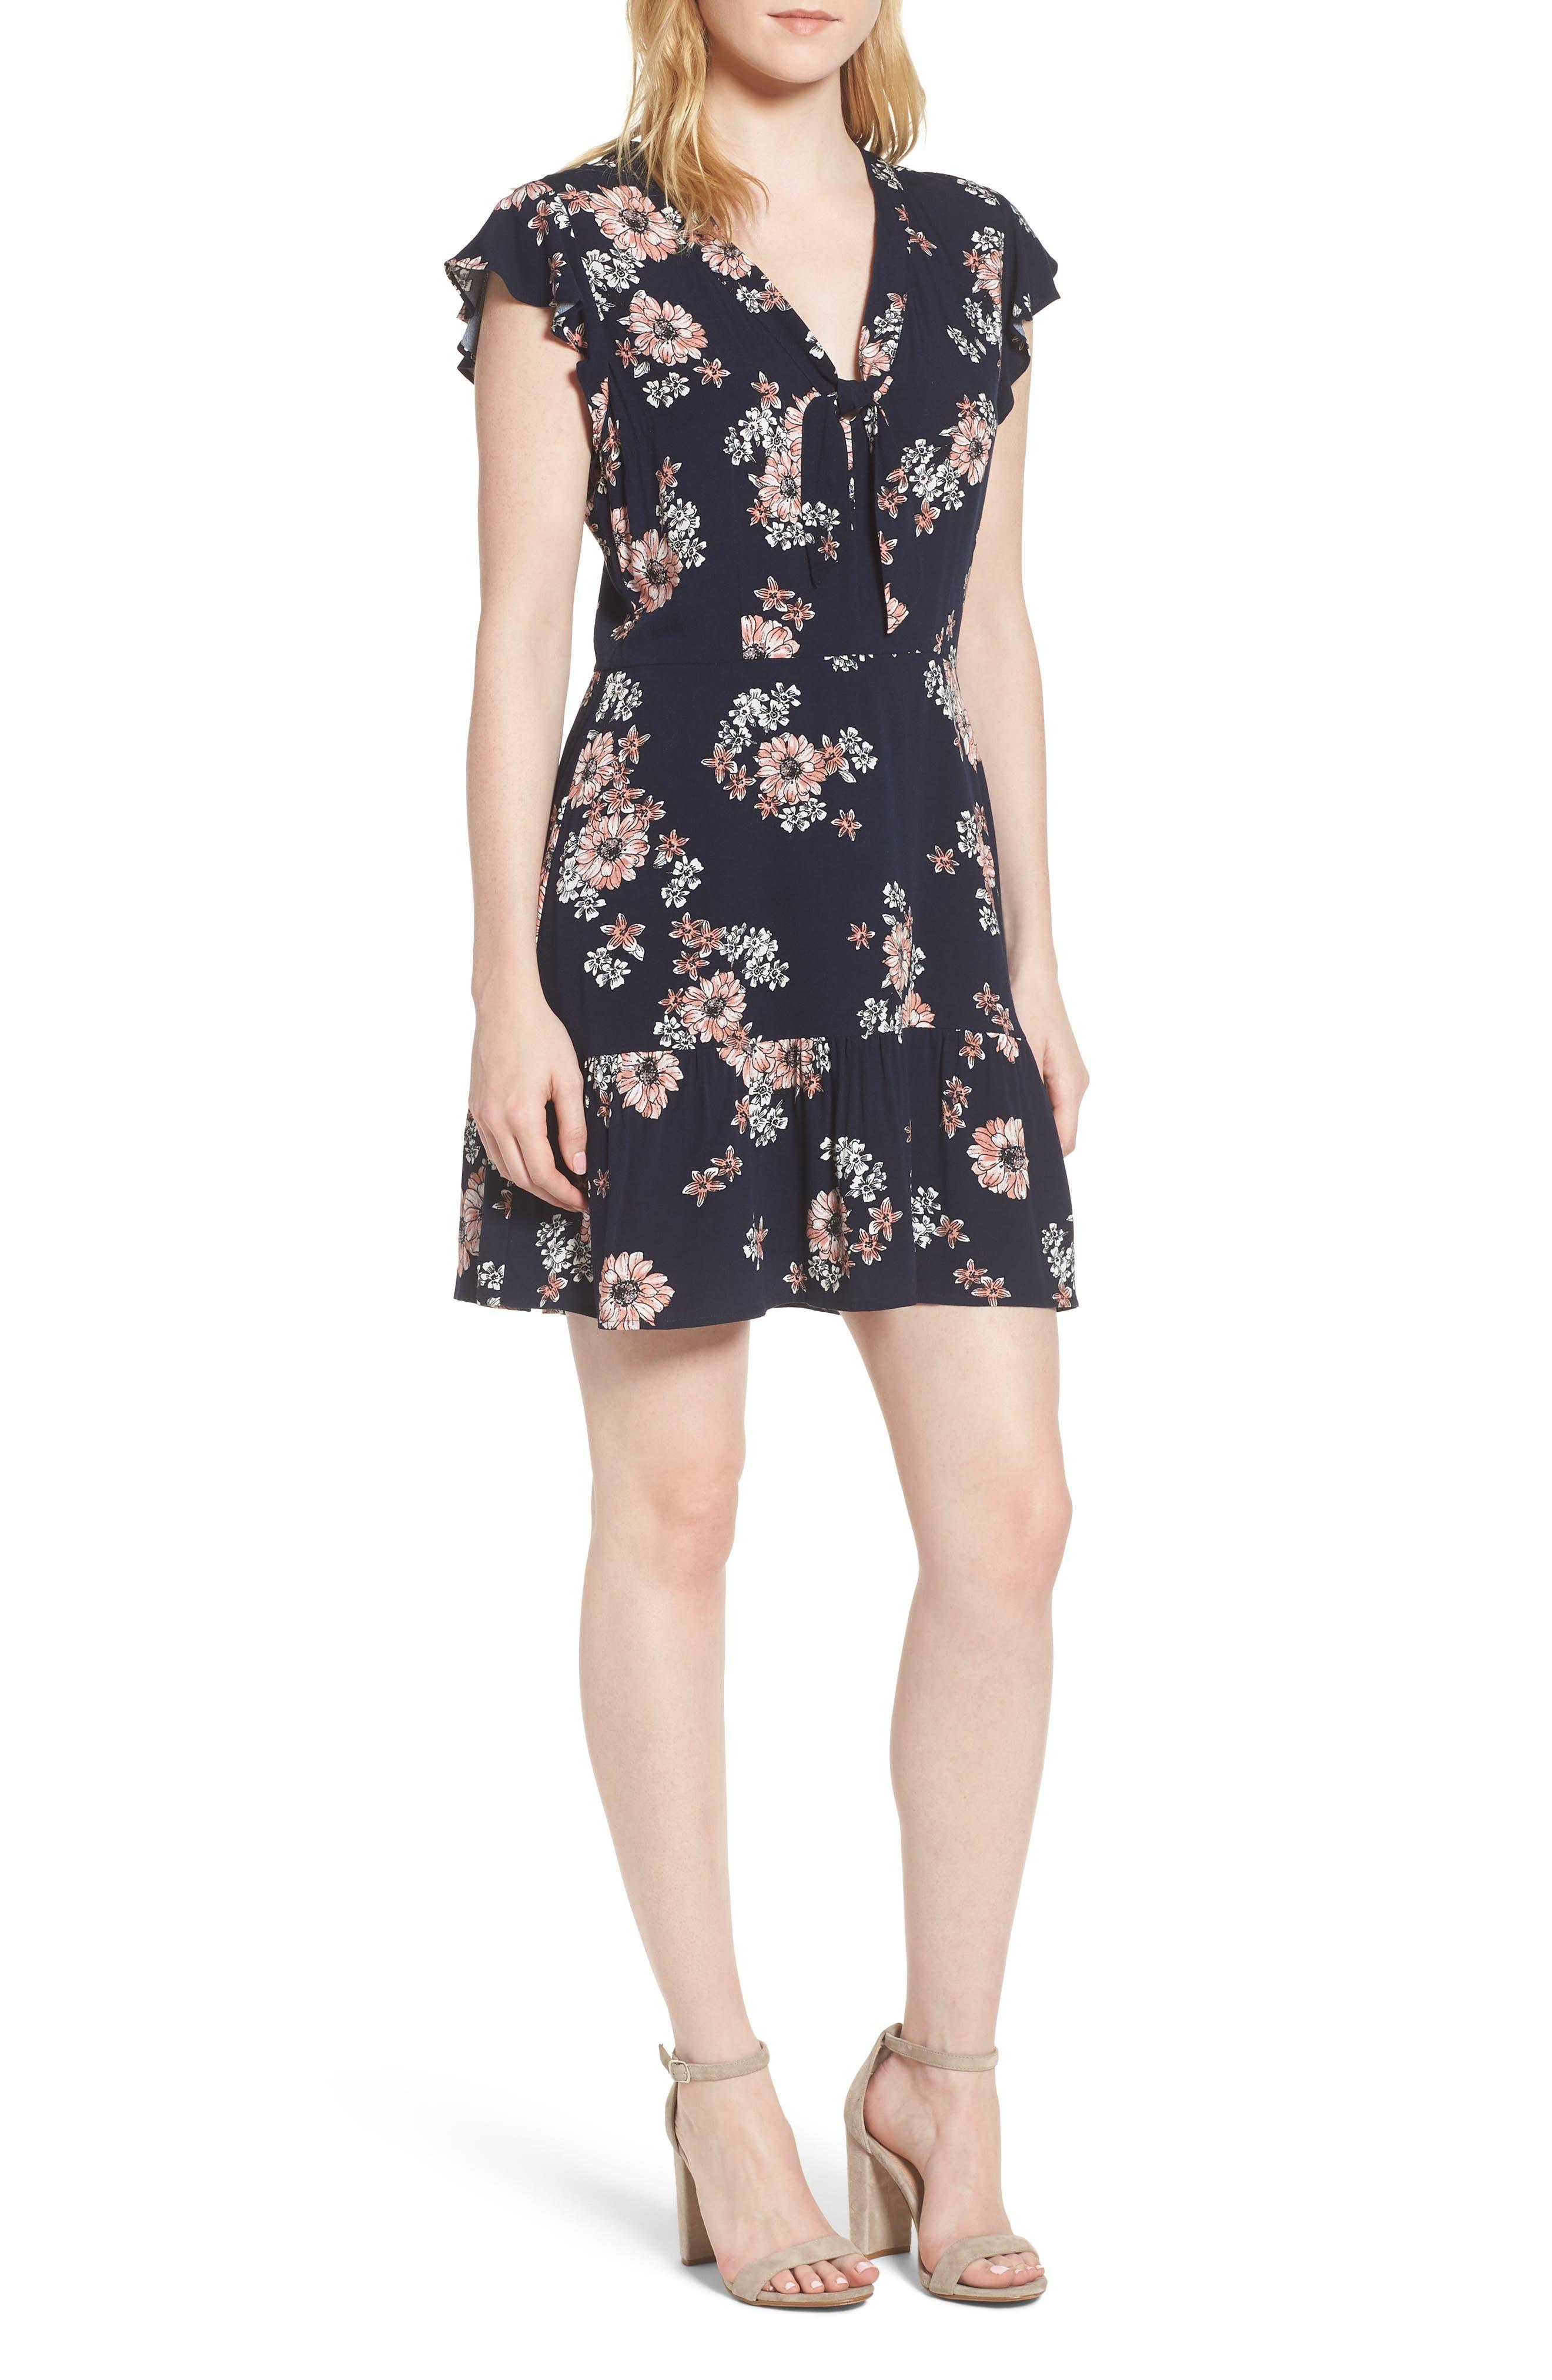 Dalma Floral Print Dress,                             Main thumbnail 1, color,